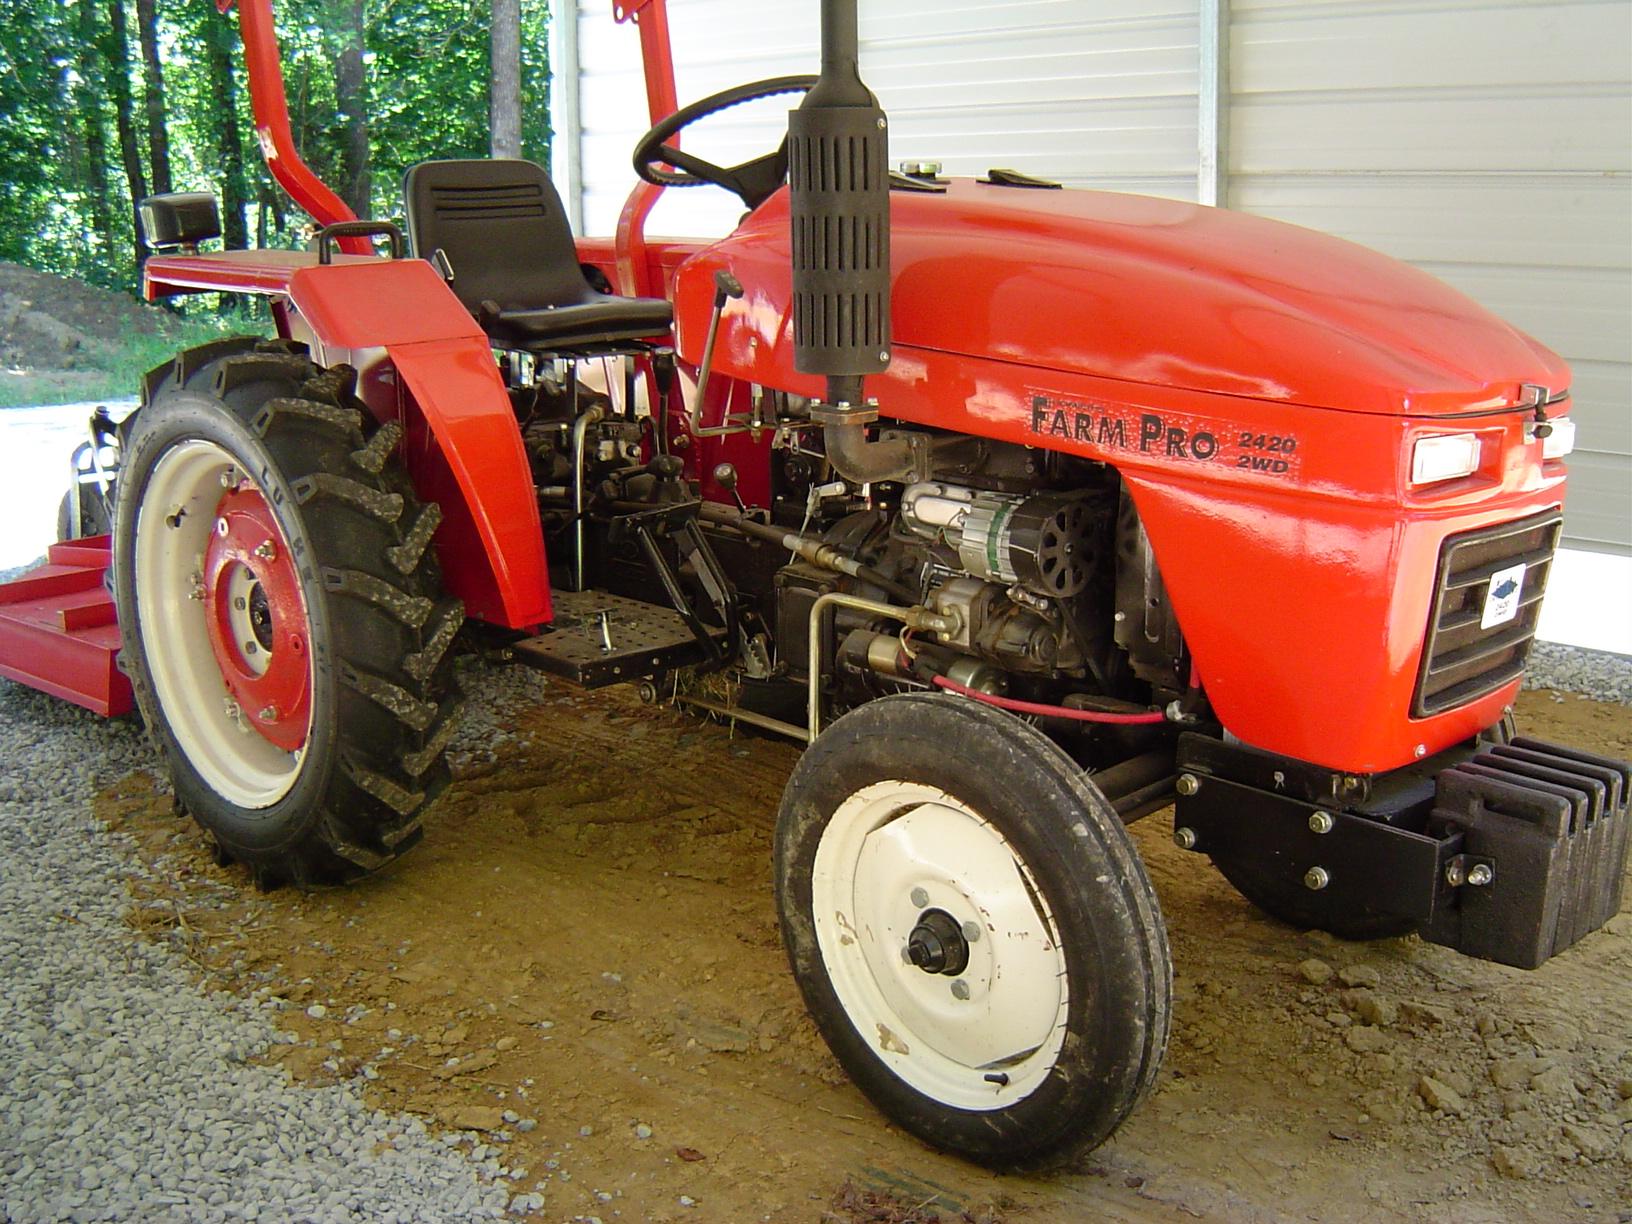 Farm Pro 2420 Farm Pro Tractor Iginition Switch Wiring Diagram on